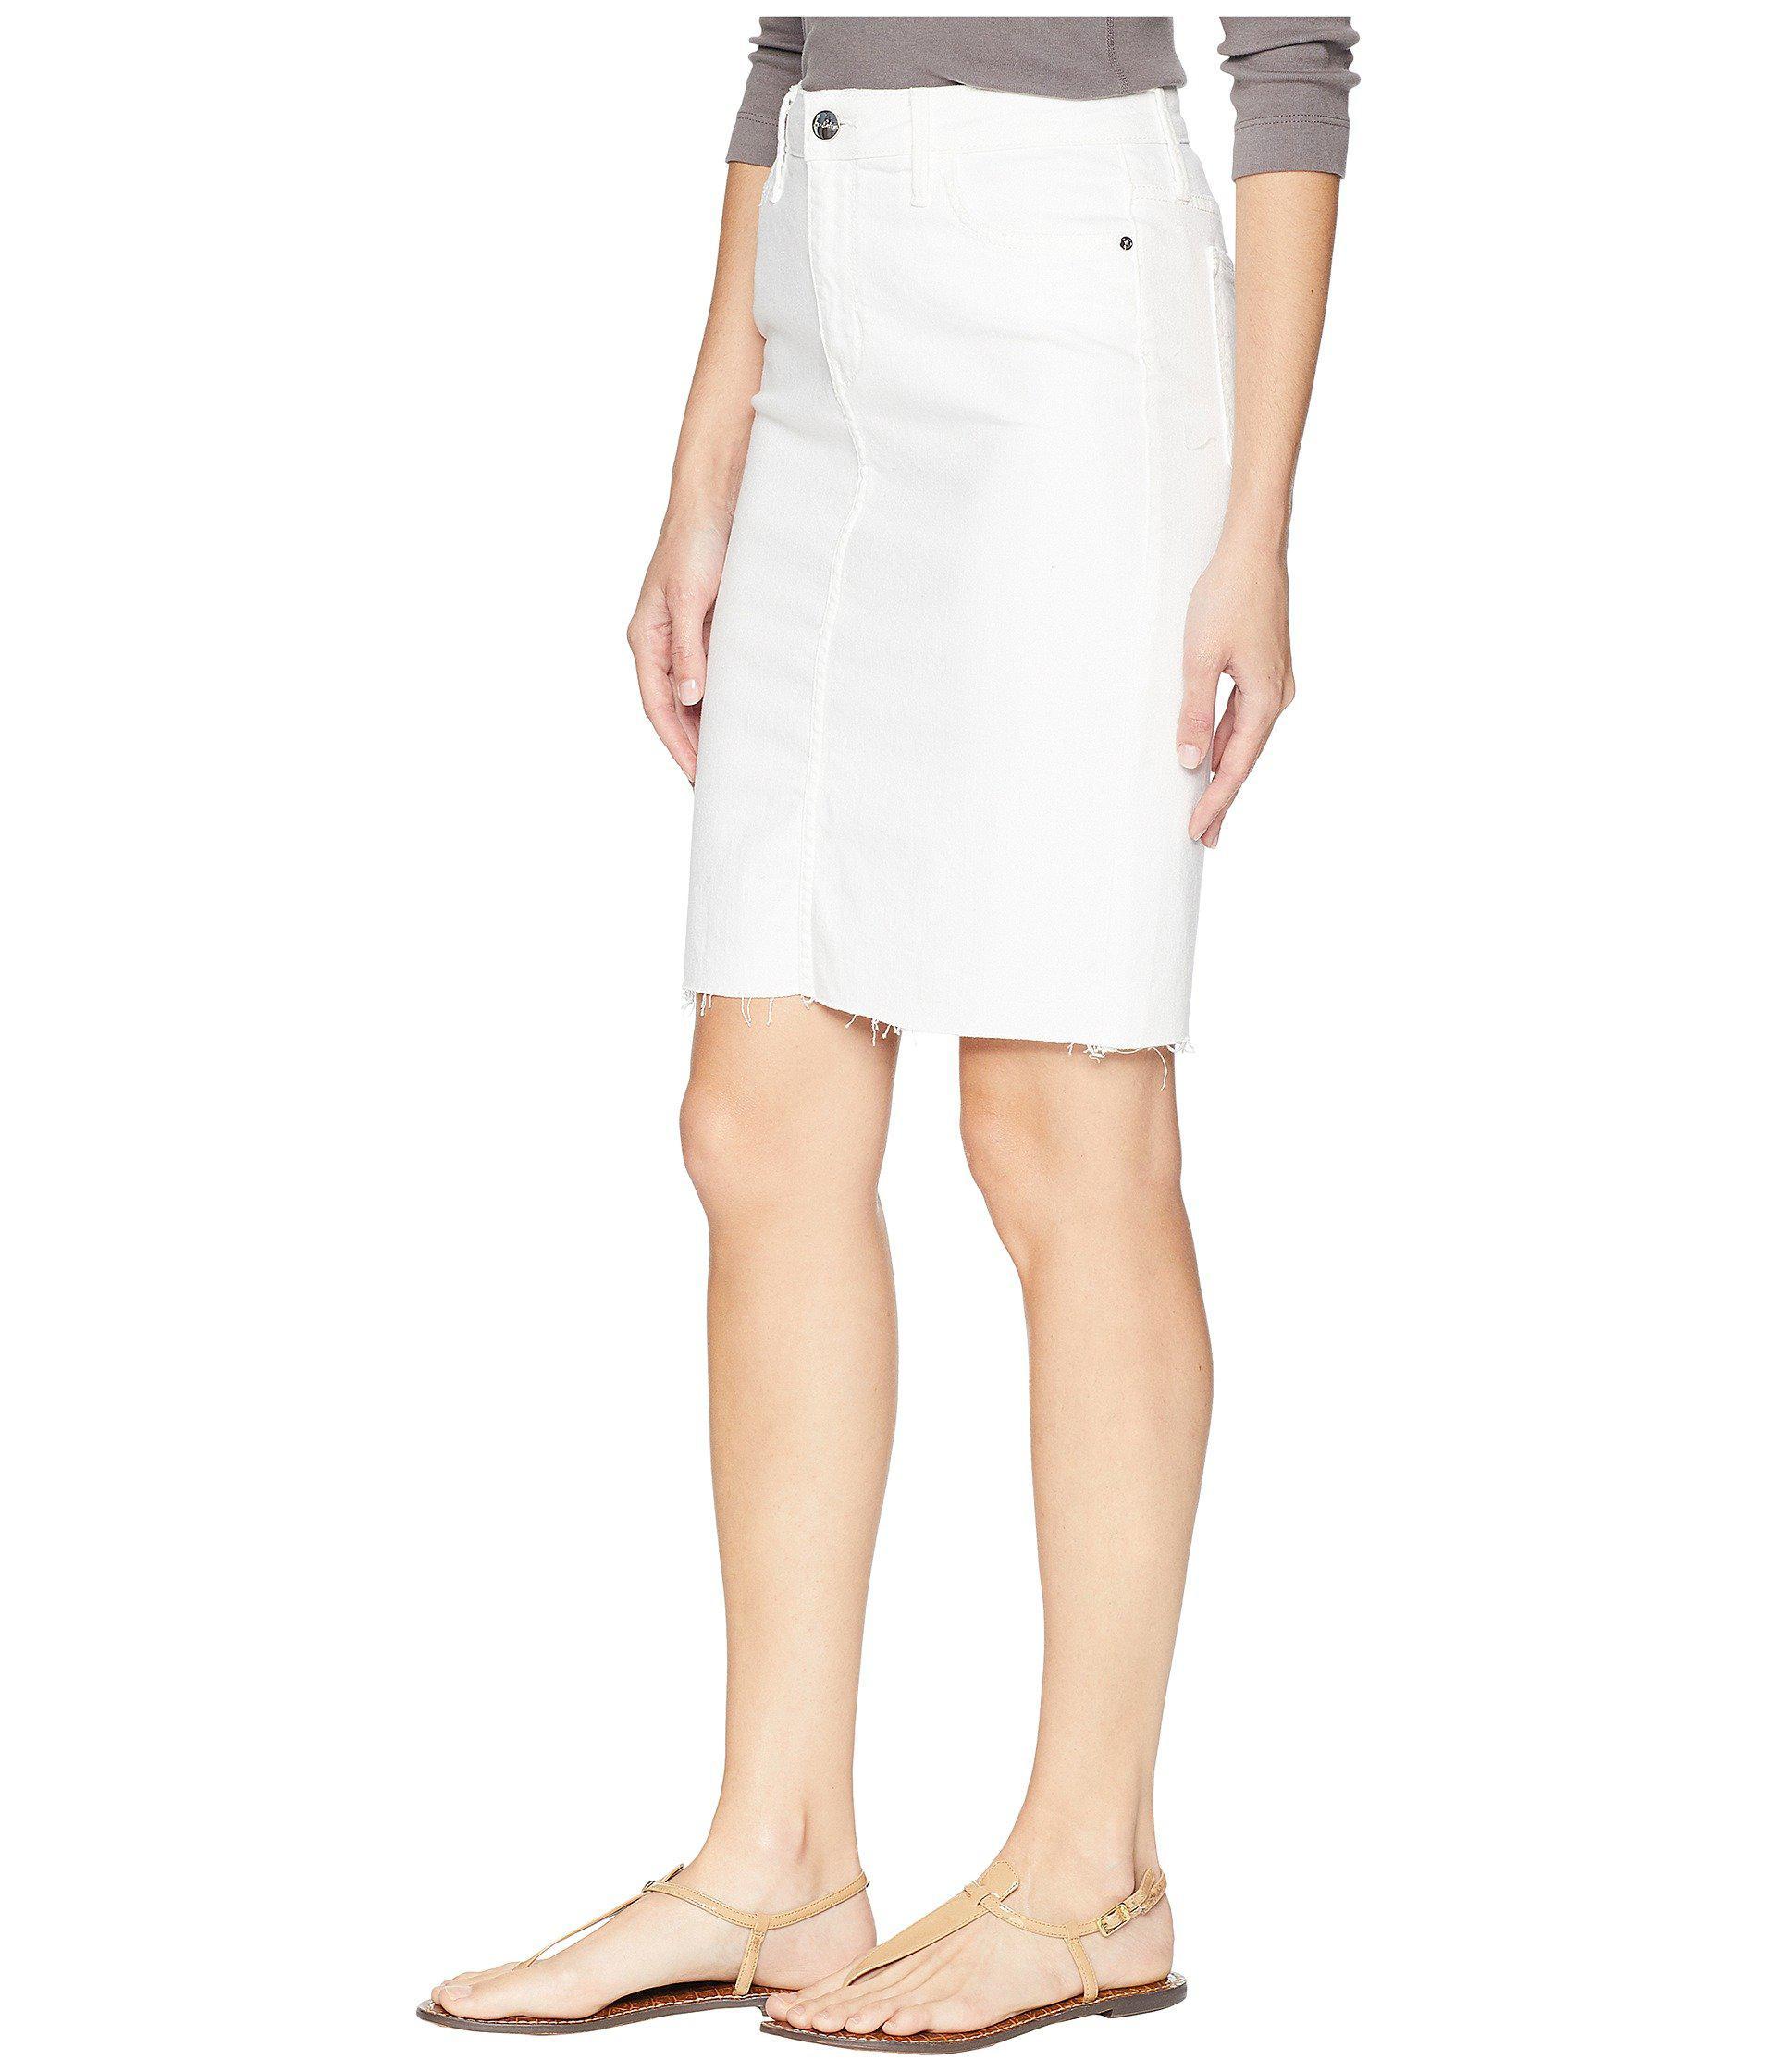 6e15266f4 Lyst - Sam Edelman The Riley Skirt In Sammie in White